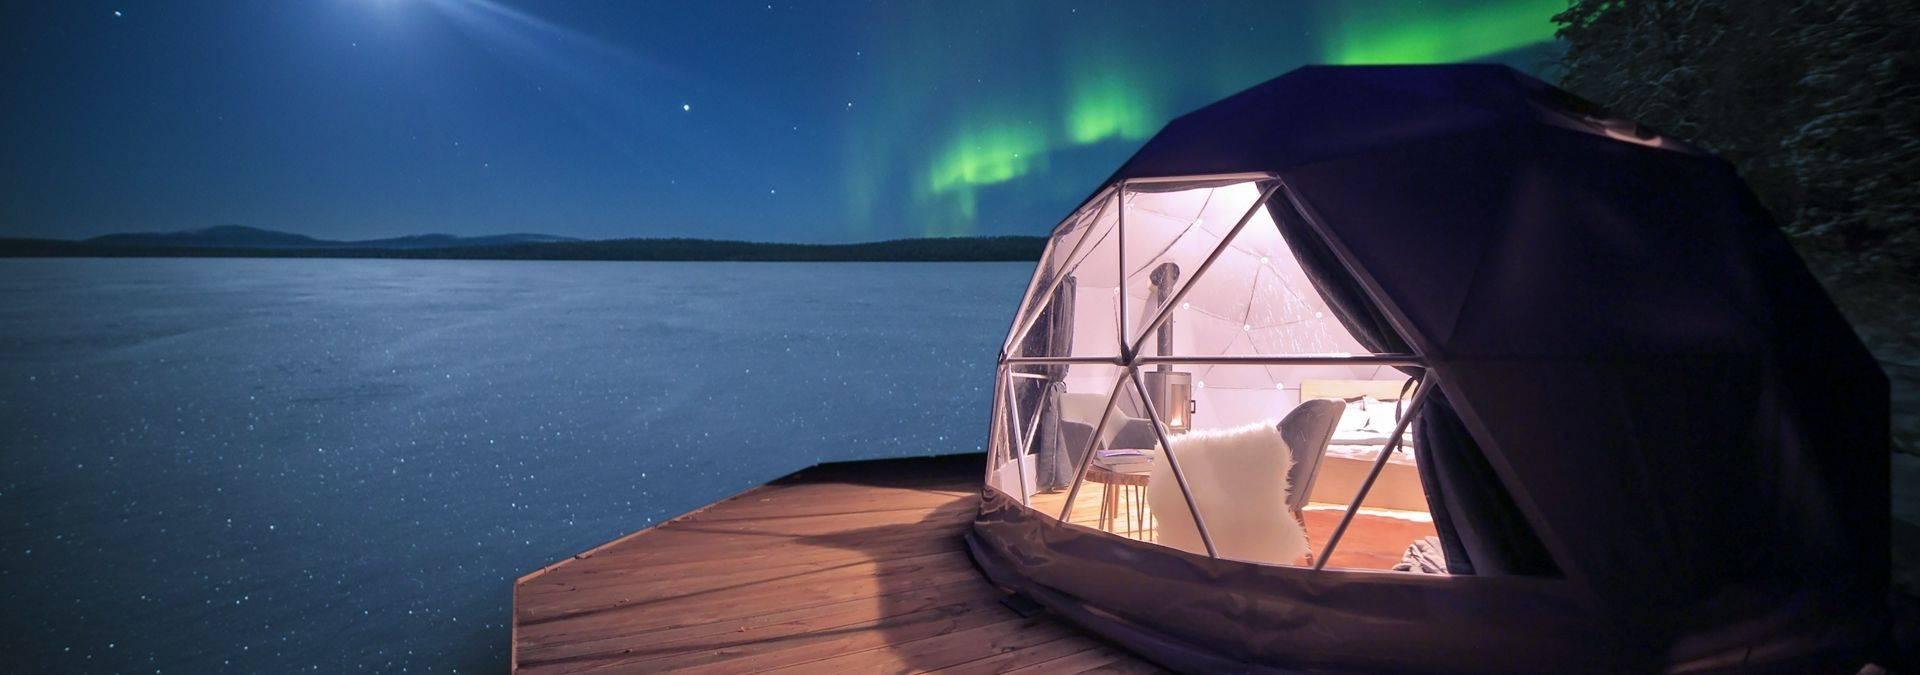 aurora dome jarven rannalla.jpg